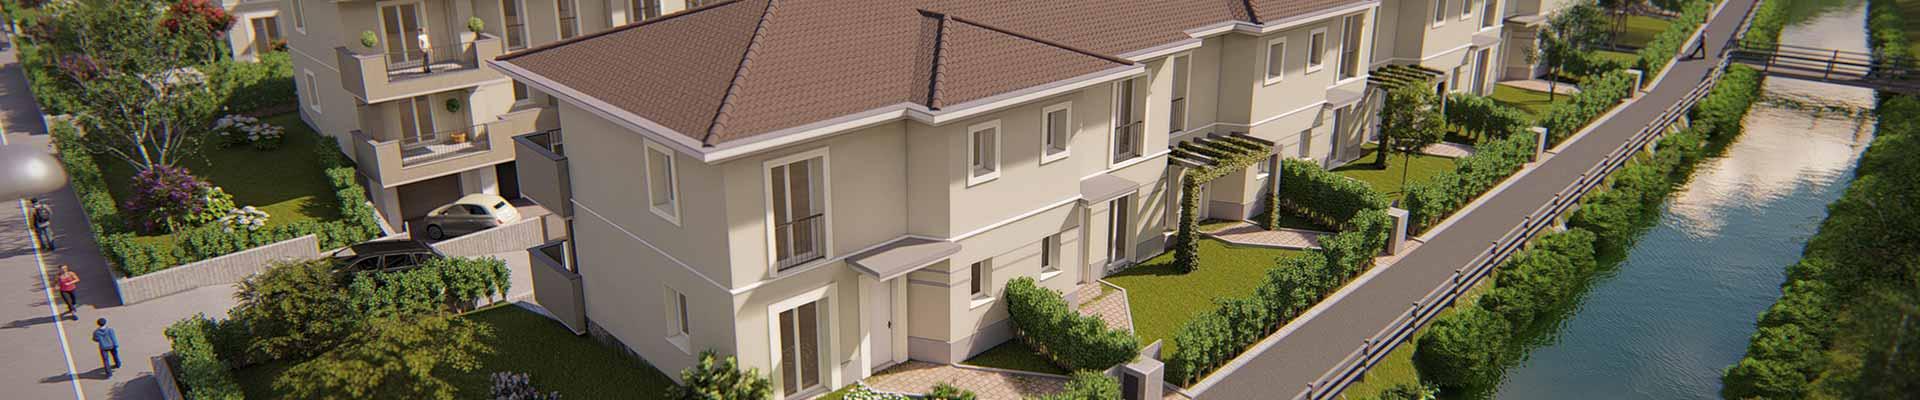 Residenza Cascina Gaita Progetto header